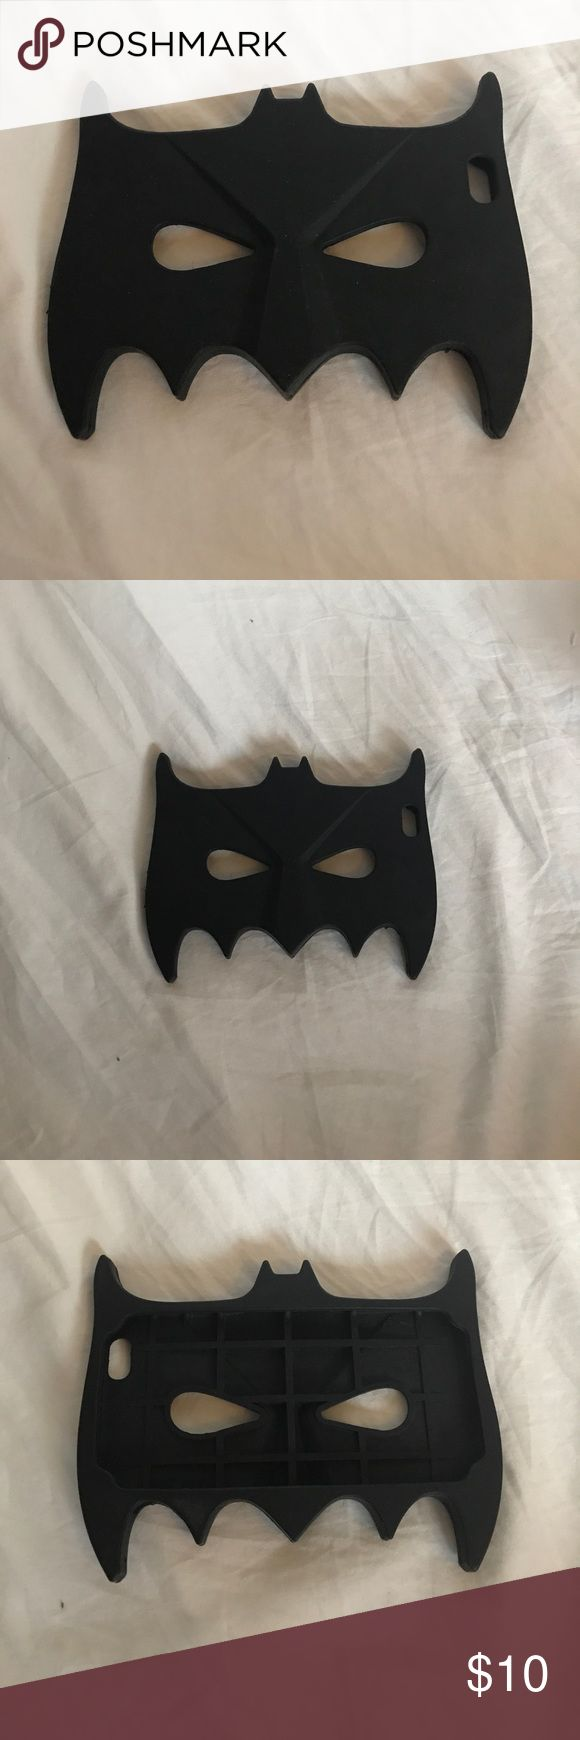 Batman 🦇 Mask IPhone 📱 6Plus Case Batman 🦇 Silicone Mask IPhone 📱 6Plus Case. This one is one ☝🏼 of my favorites! #'s tech, accessories, Accessory, phone, case, IPhone, apple, Mac, batman, D.C., superhero, sale, sell, priced to sell 🛍❤️🐱 Accessories Phone Cases